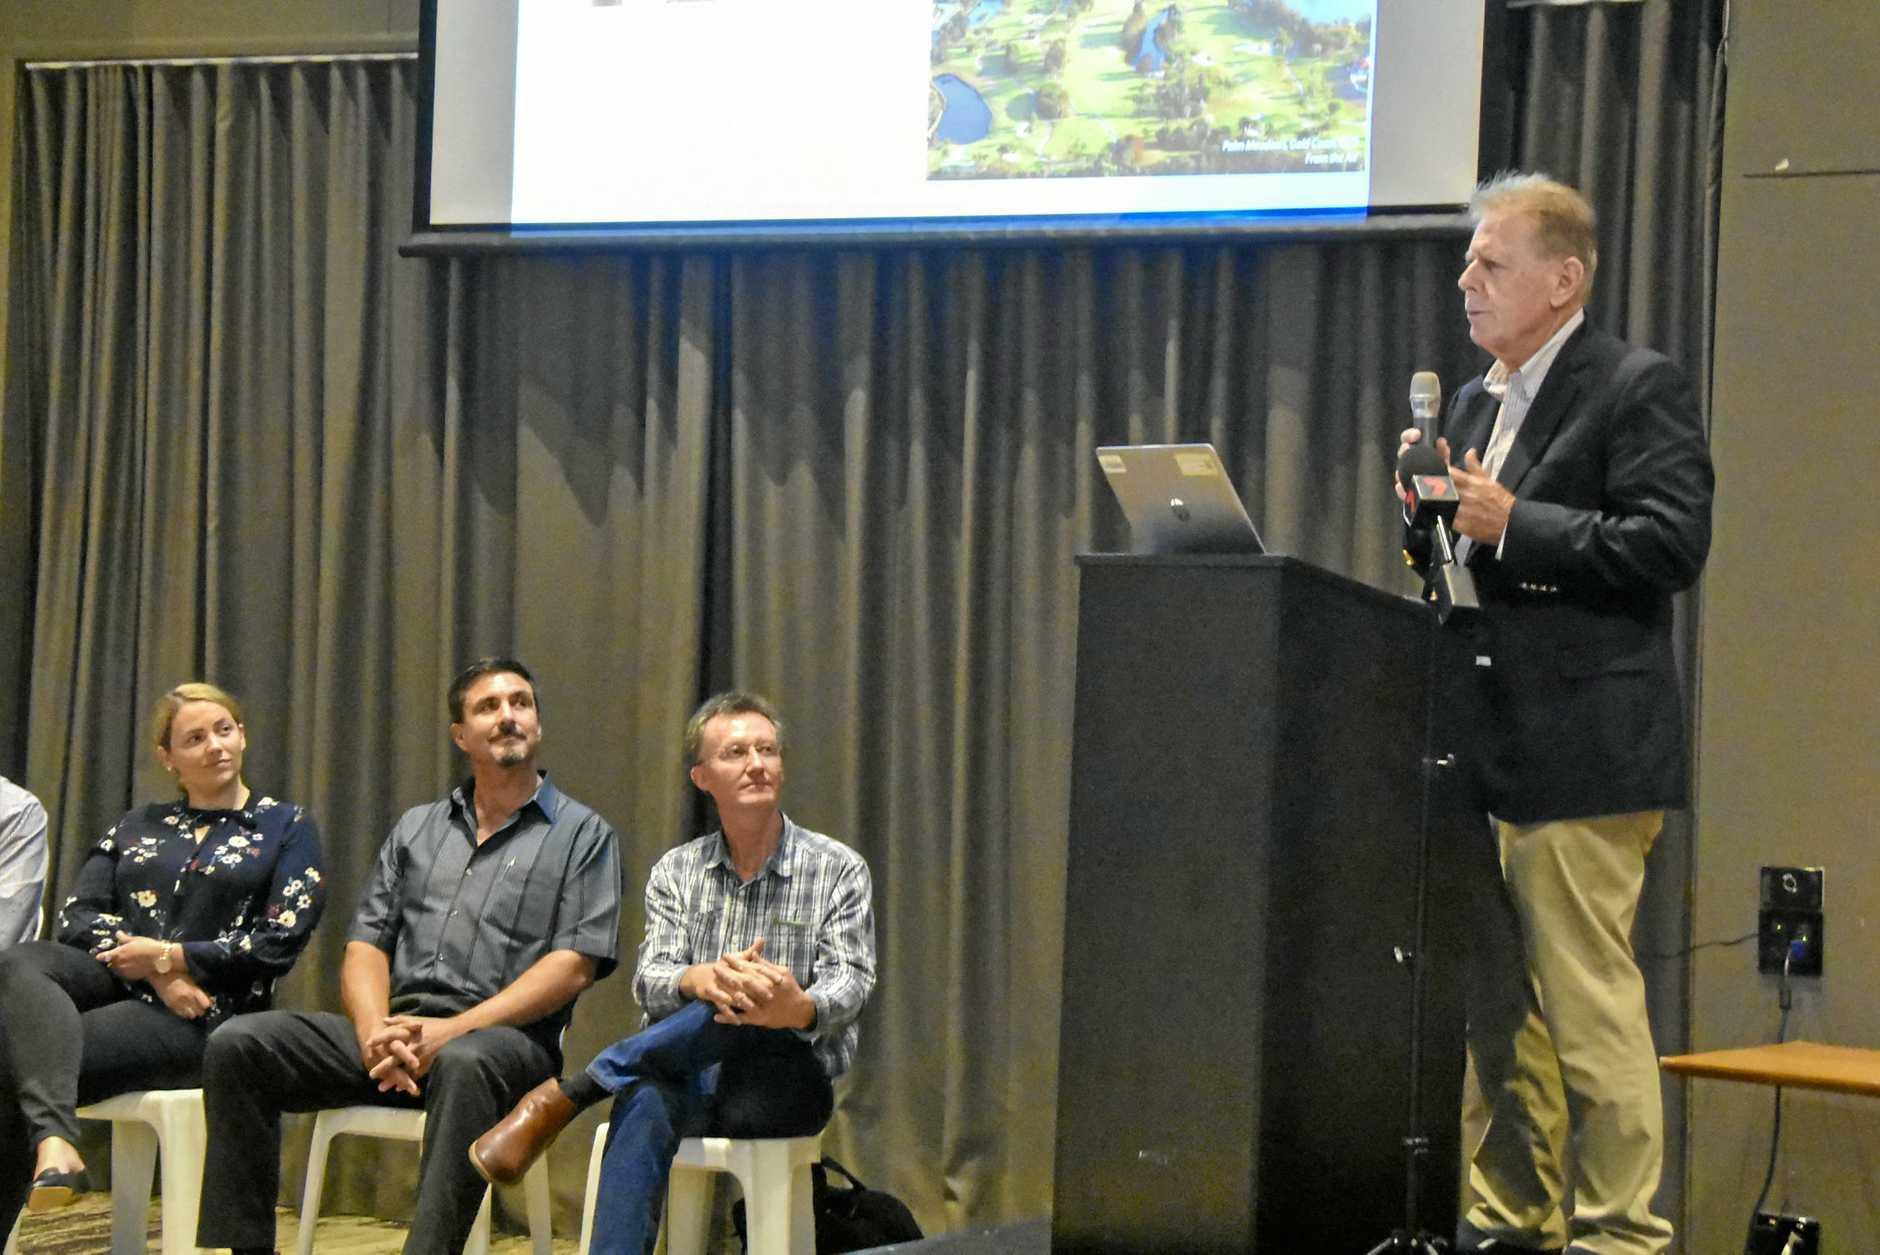 Station Creek Lifestyle Village golf course designer Graham Marsh speaking at a community forum on Wednesday night.